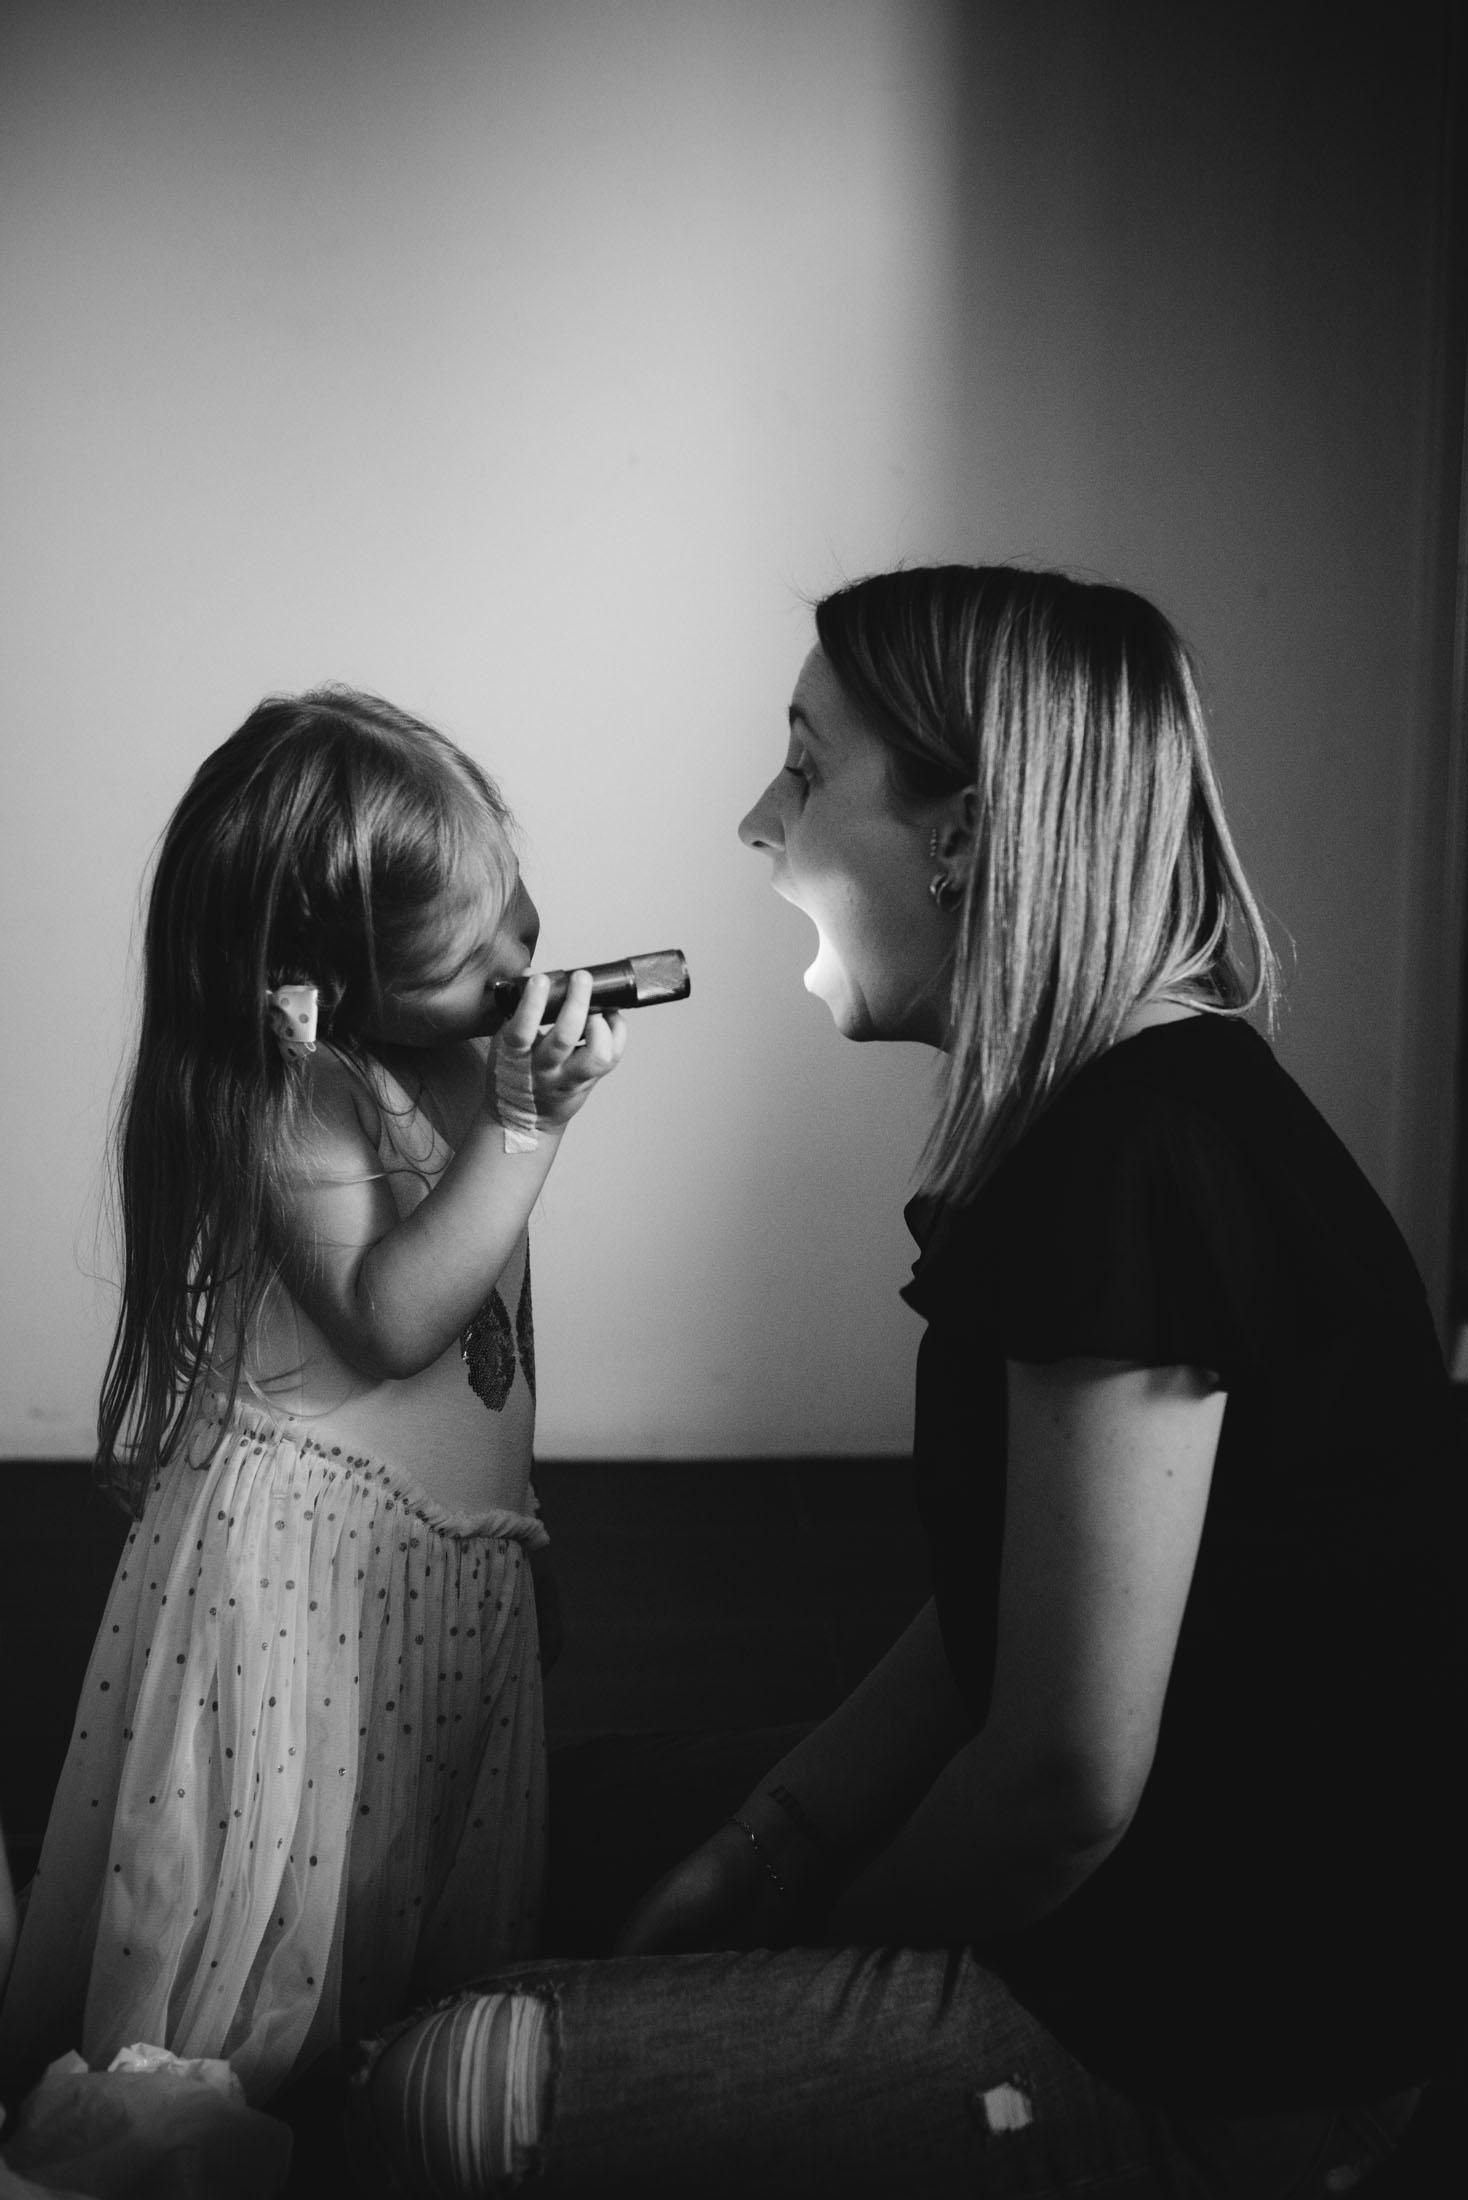 Sach_Family-Photography-unposed10.JPG